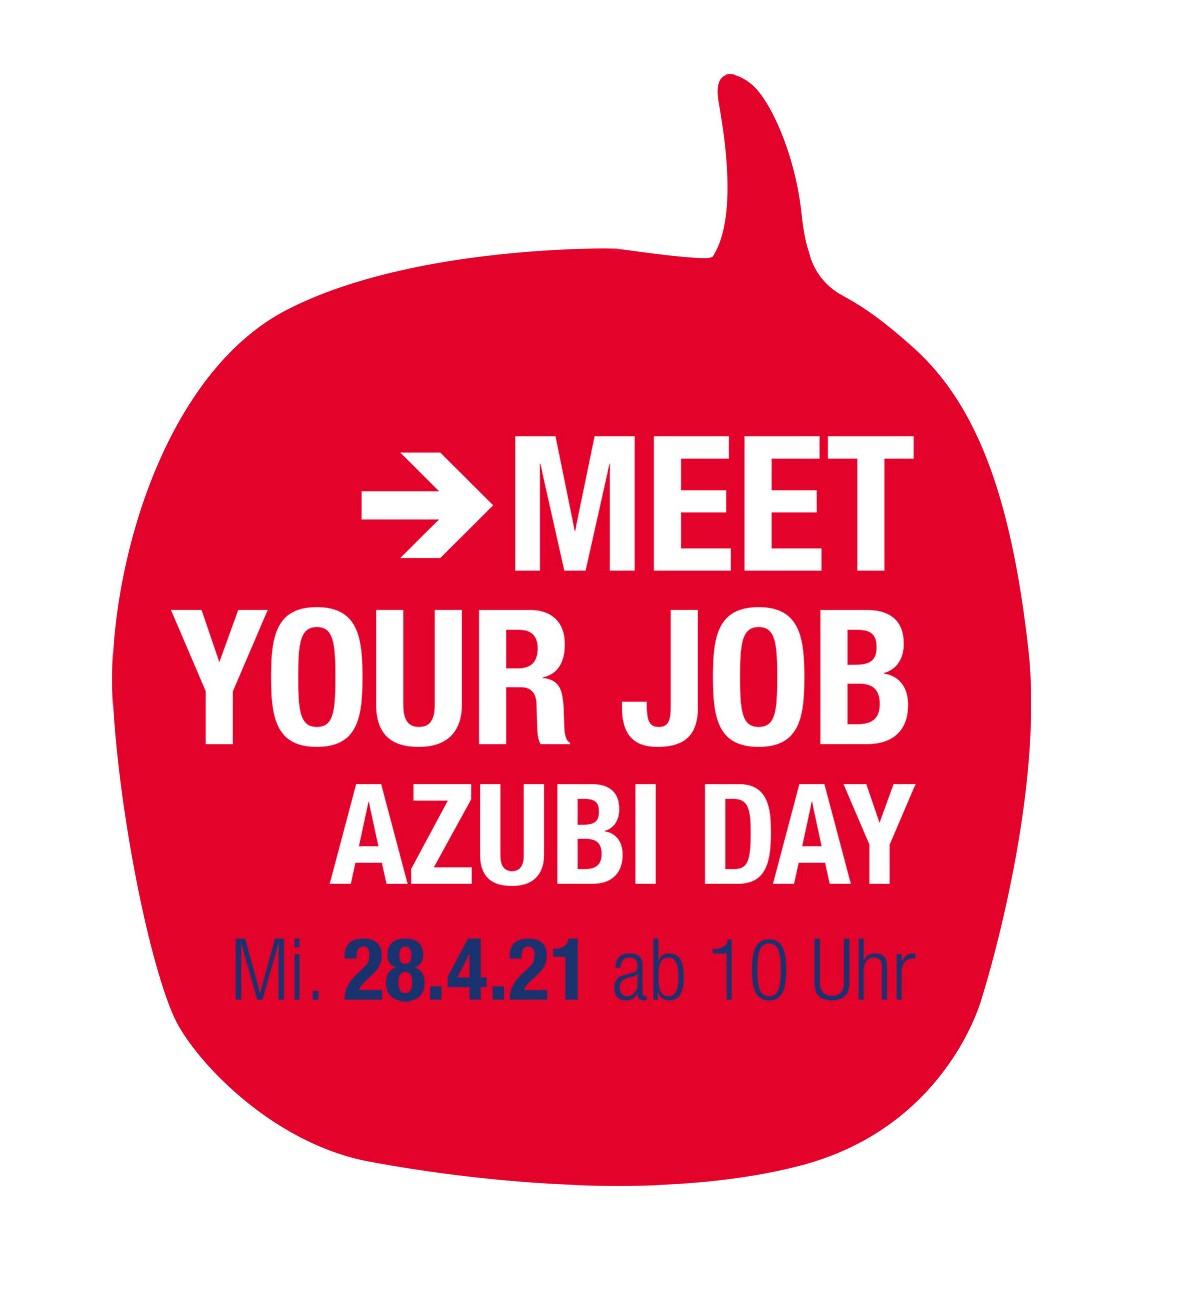 Logo für den Azubi Tag am 28.04.21